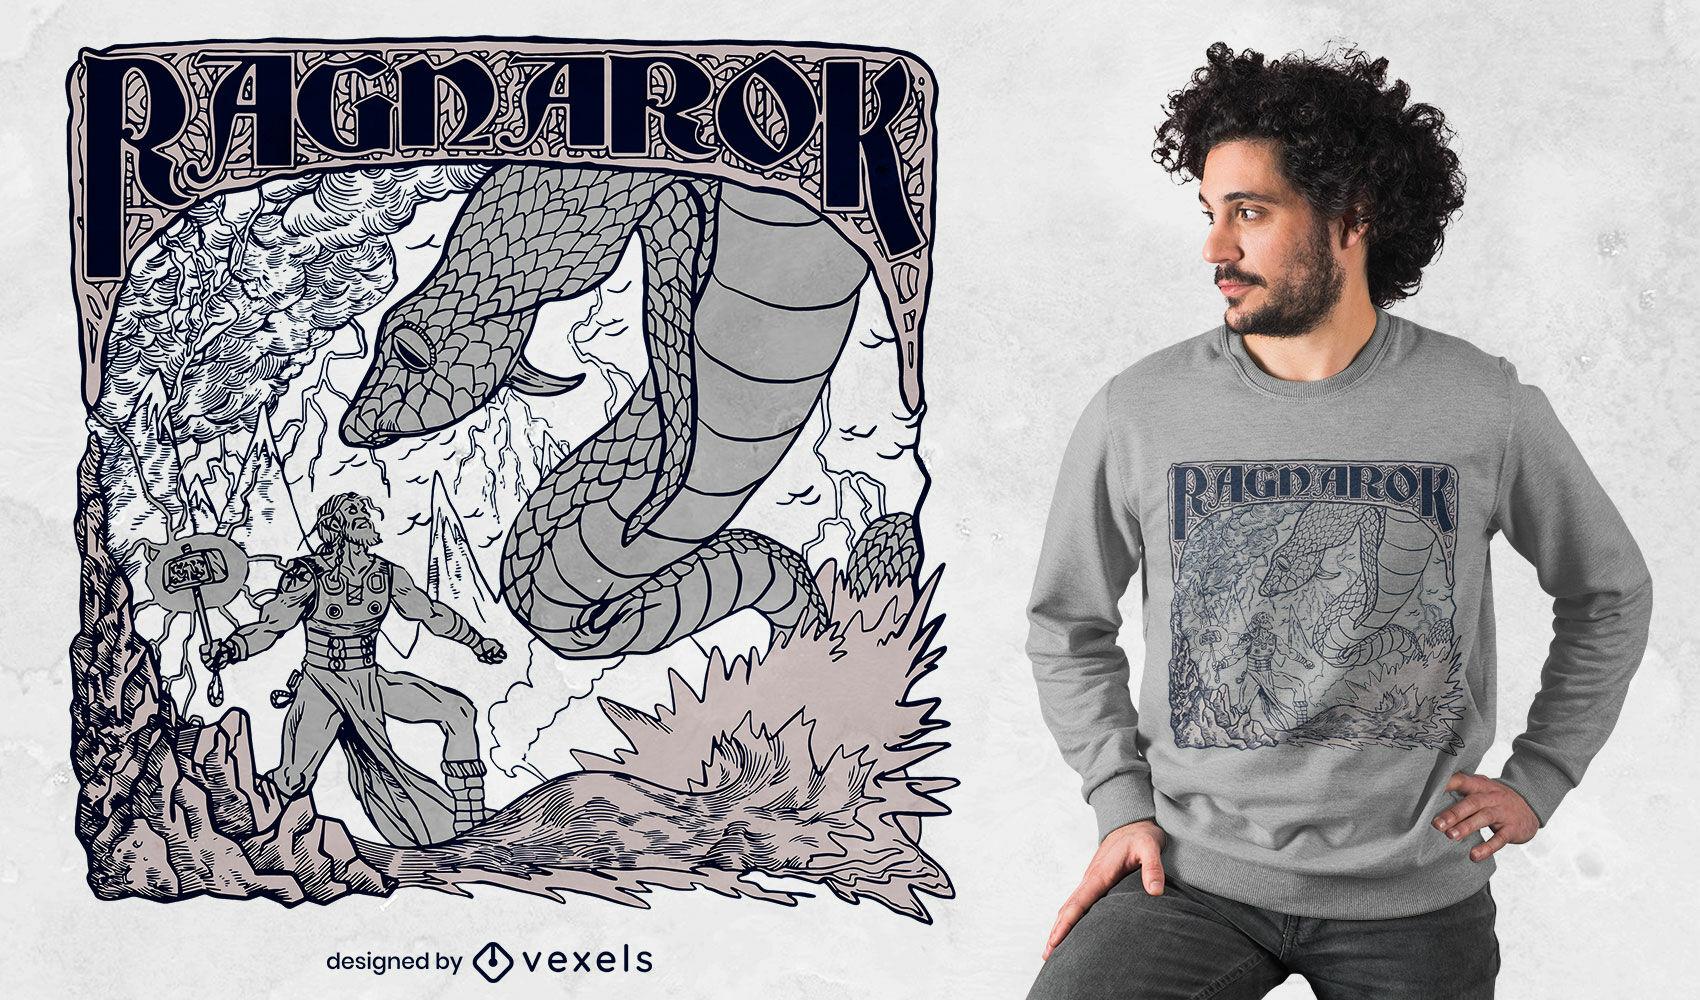 Ragnarok Norse mythology battle t-shirt design